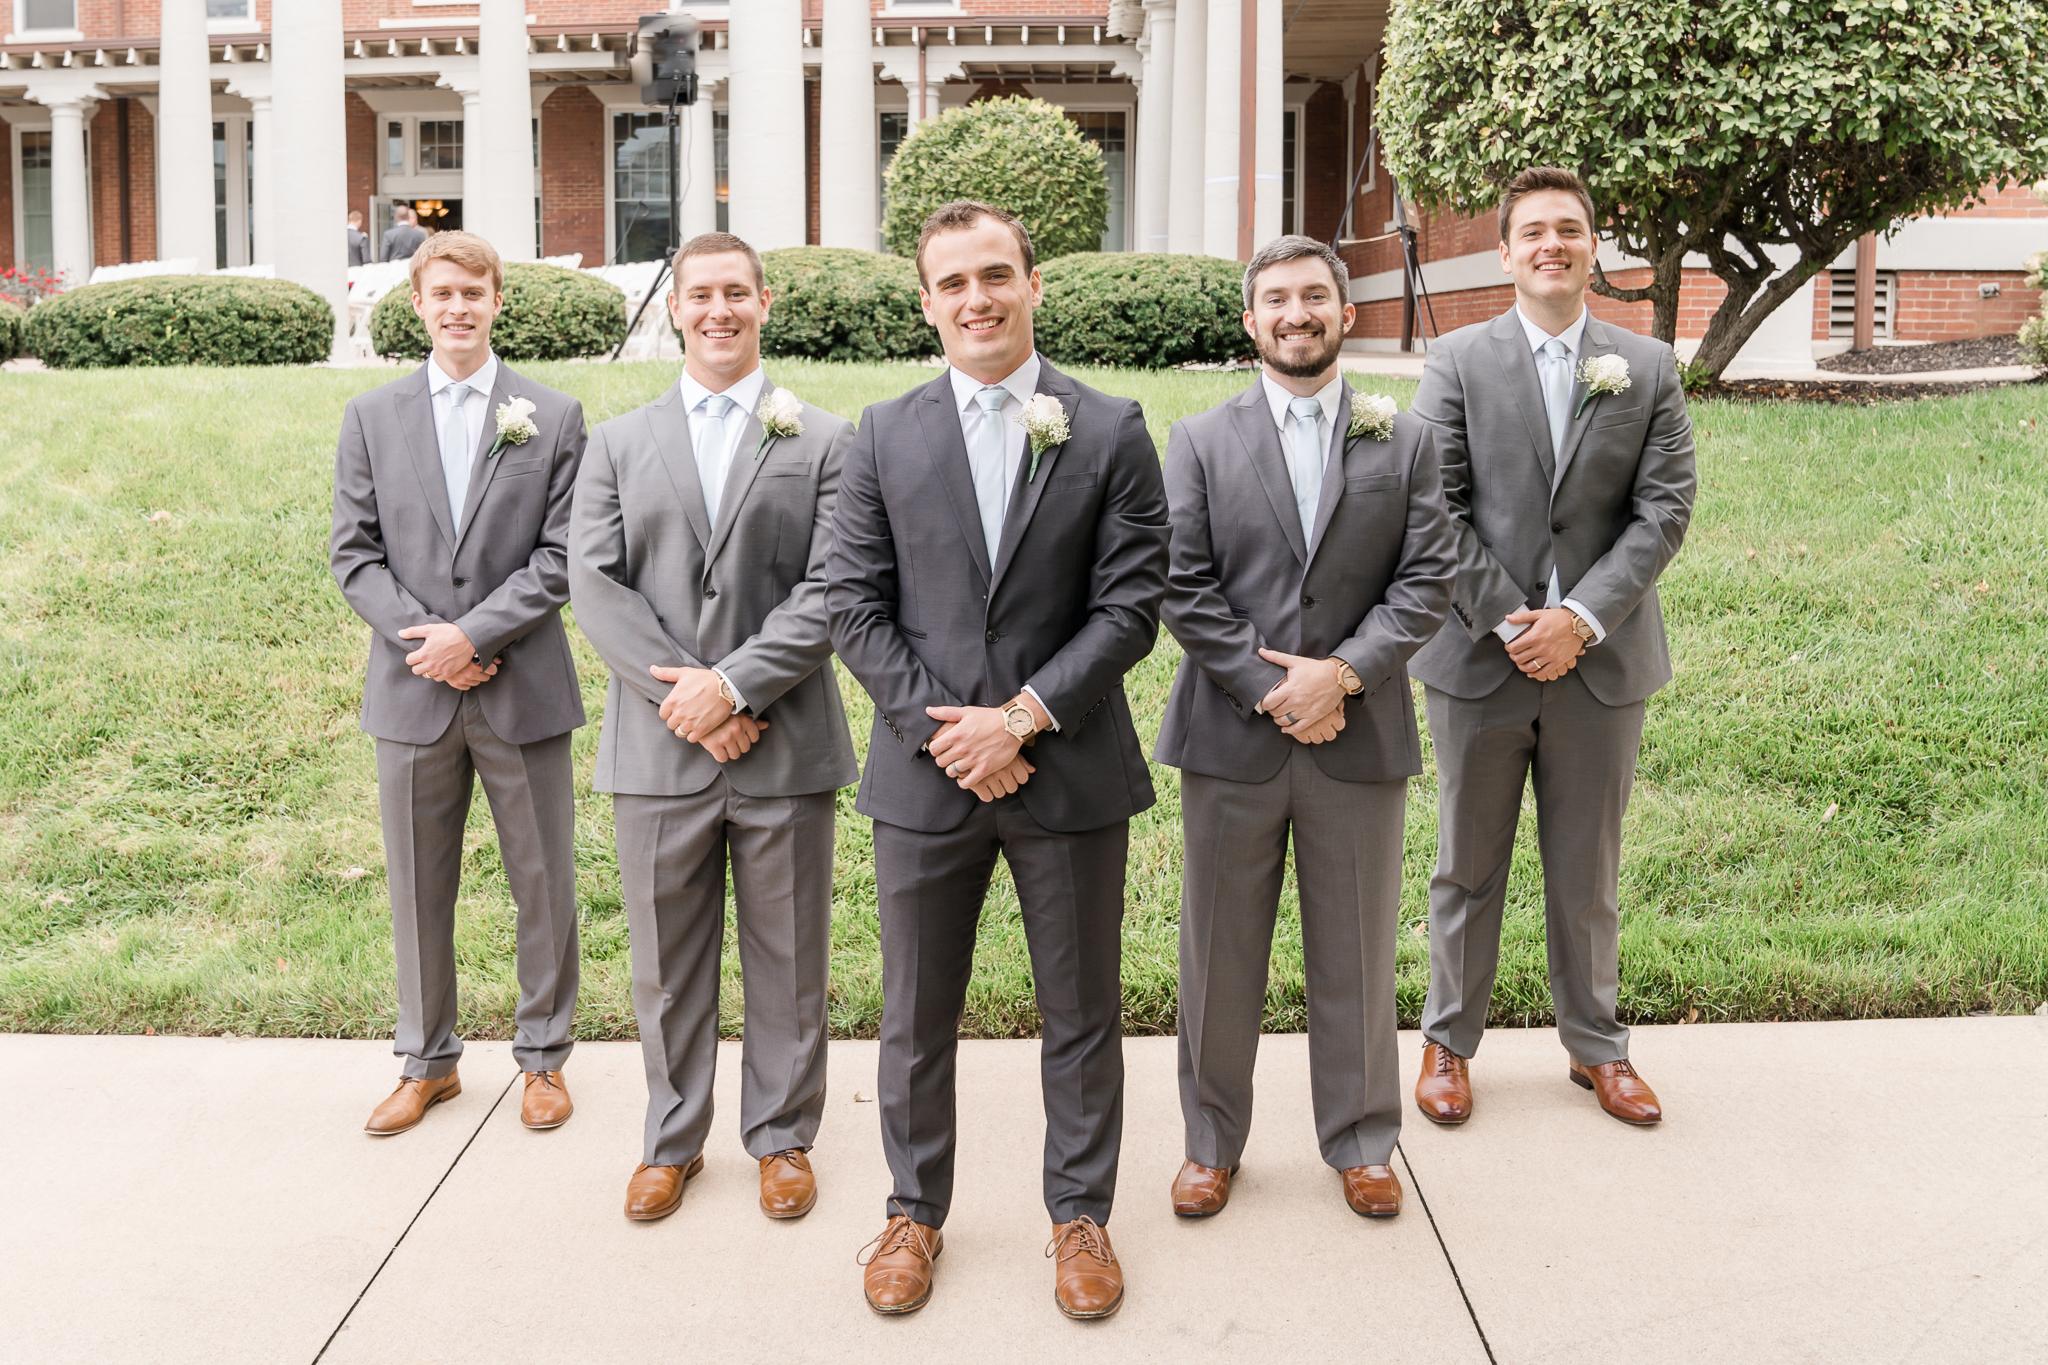 Westminister Hall Wedding Winona Lake Indiana07125.jpg